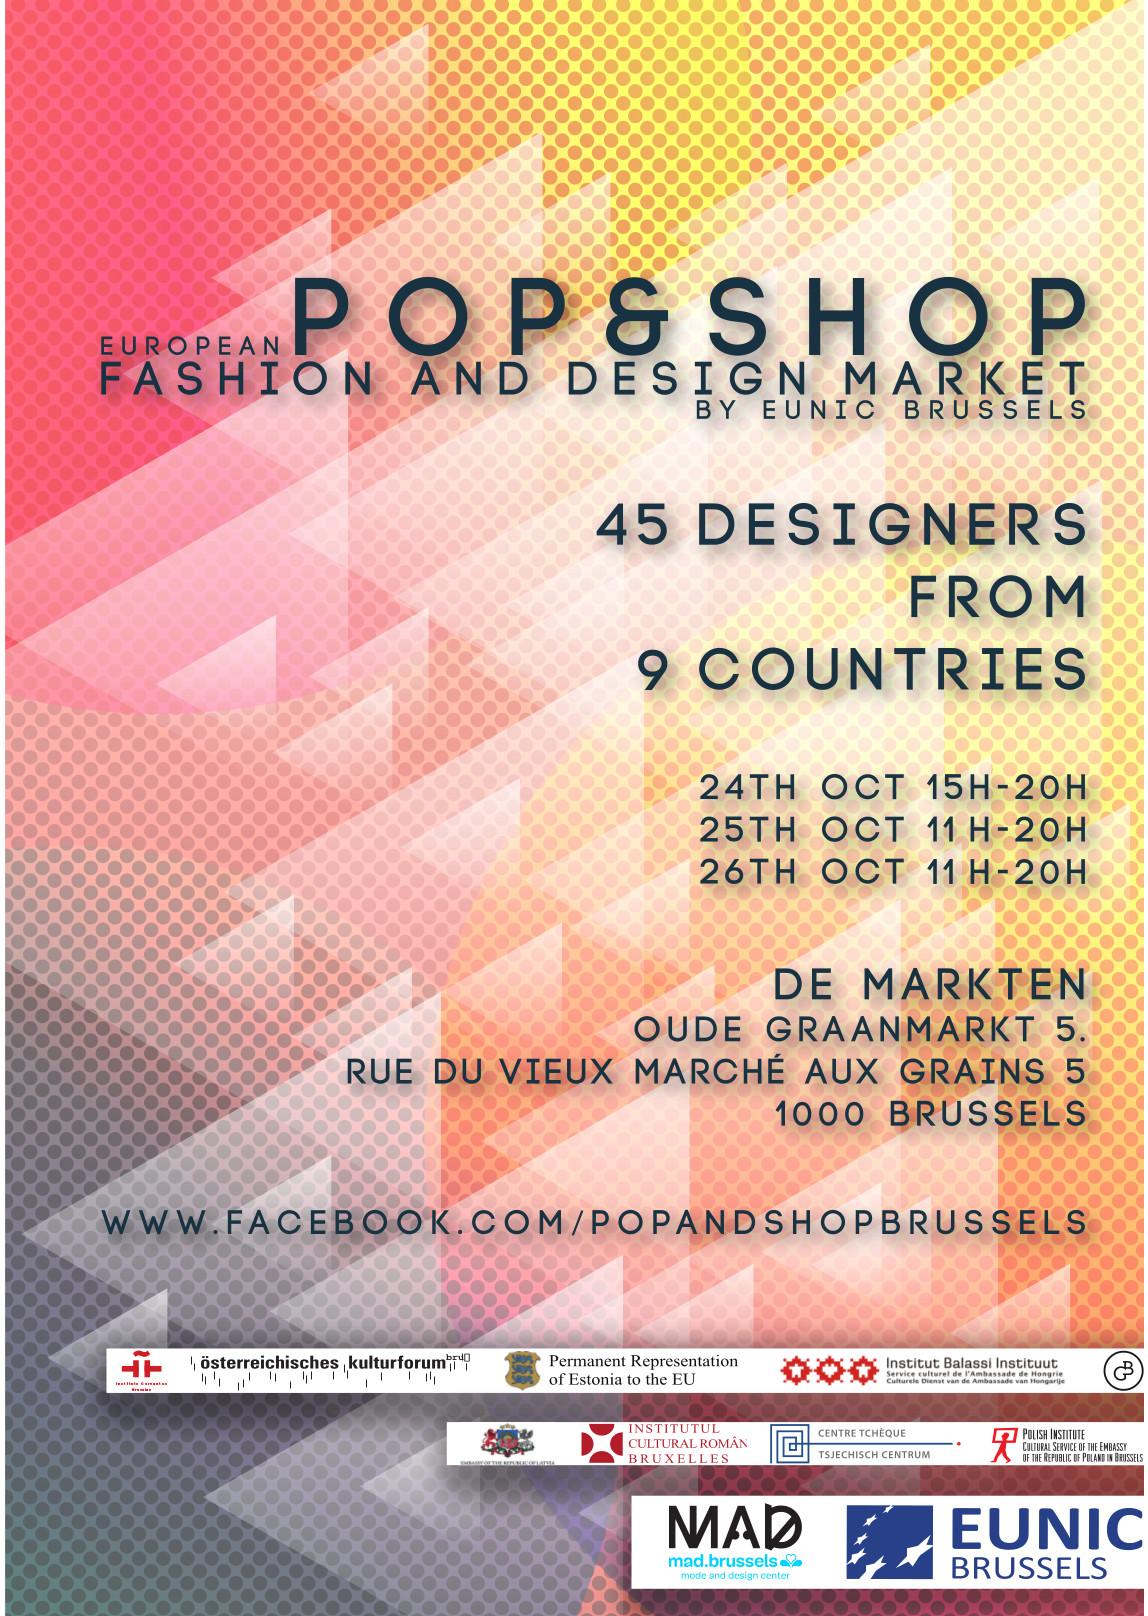 European Pop & Shop